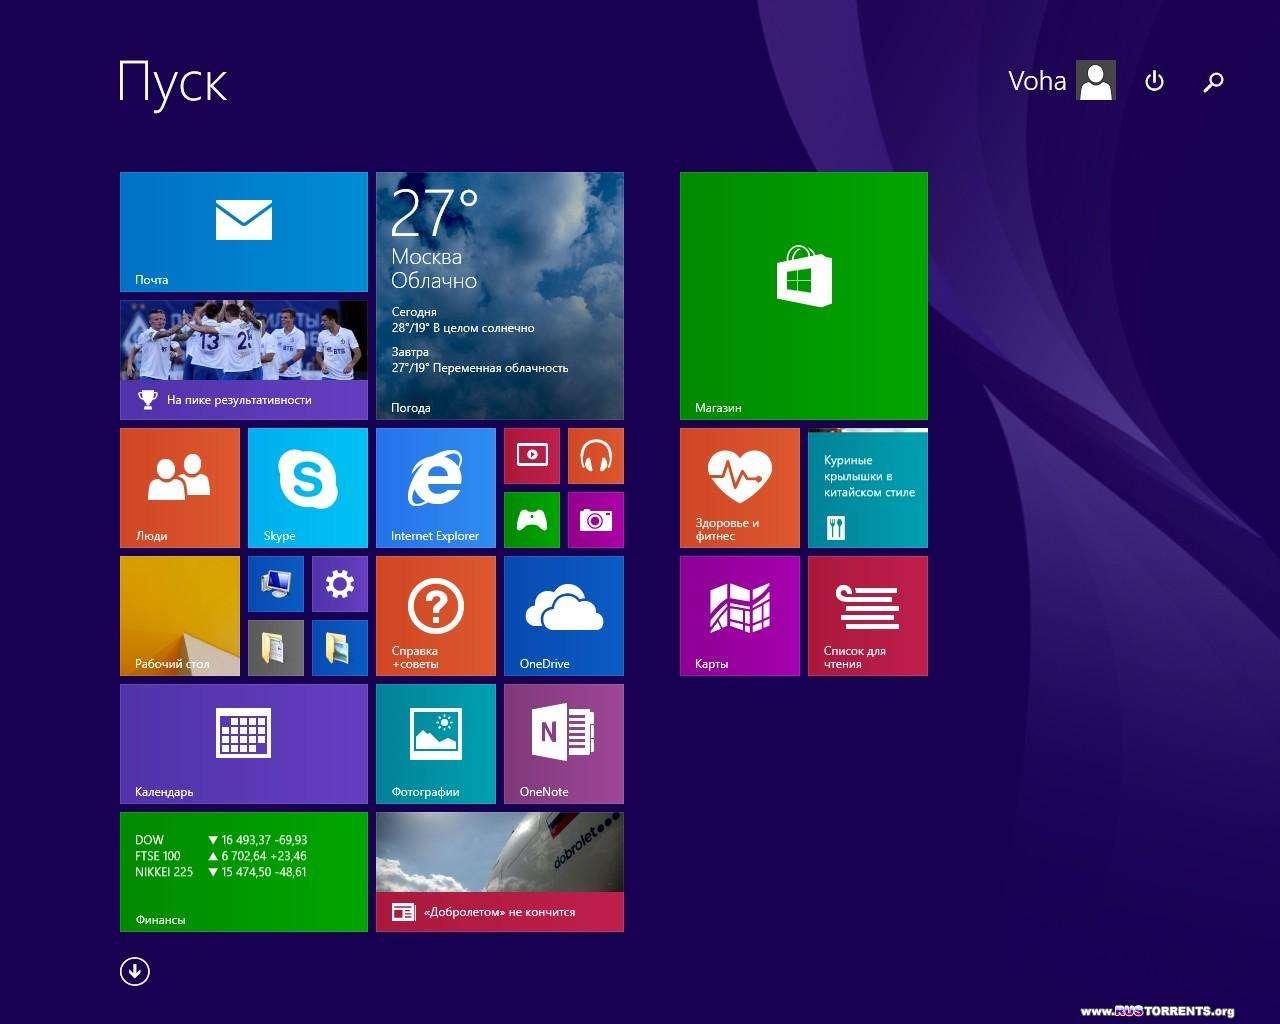 Windows 8.1 Enterprise x64/x86 + Office 2013 Pro Full v.23.07 By DDGroup & Leha342 (23.07.2014) RUS   PC